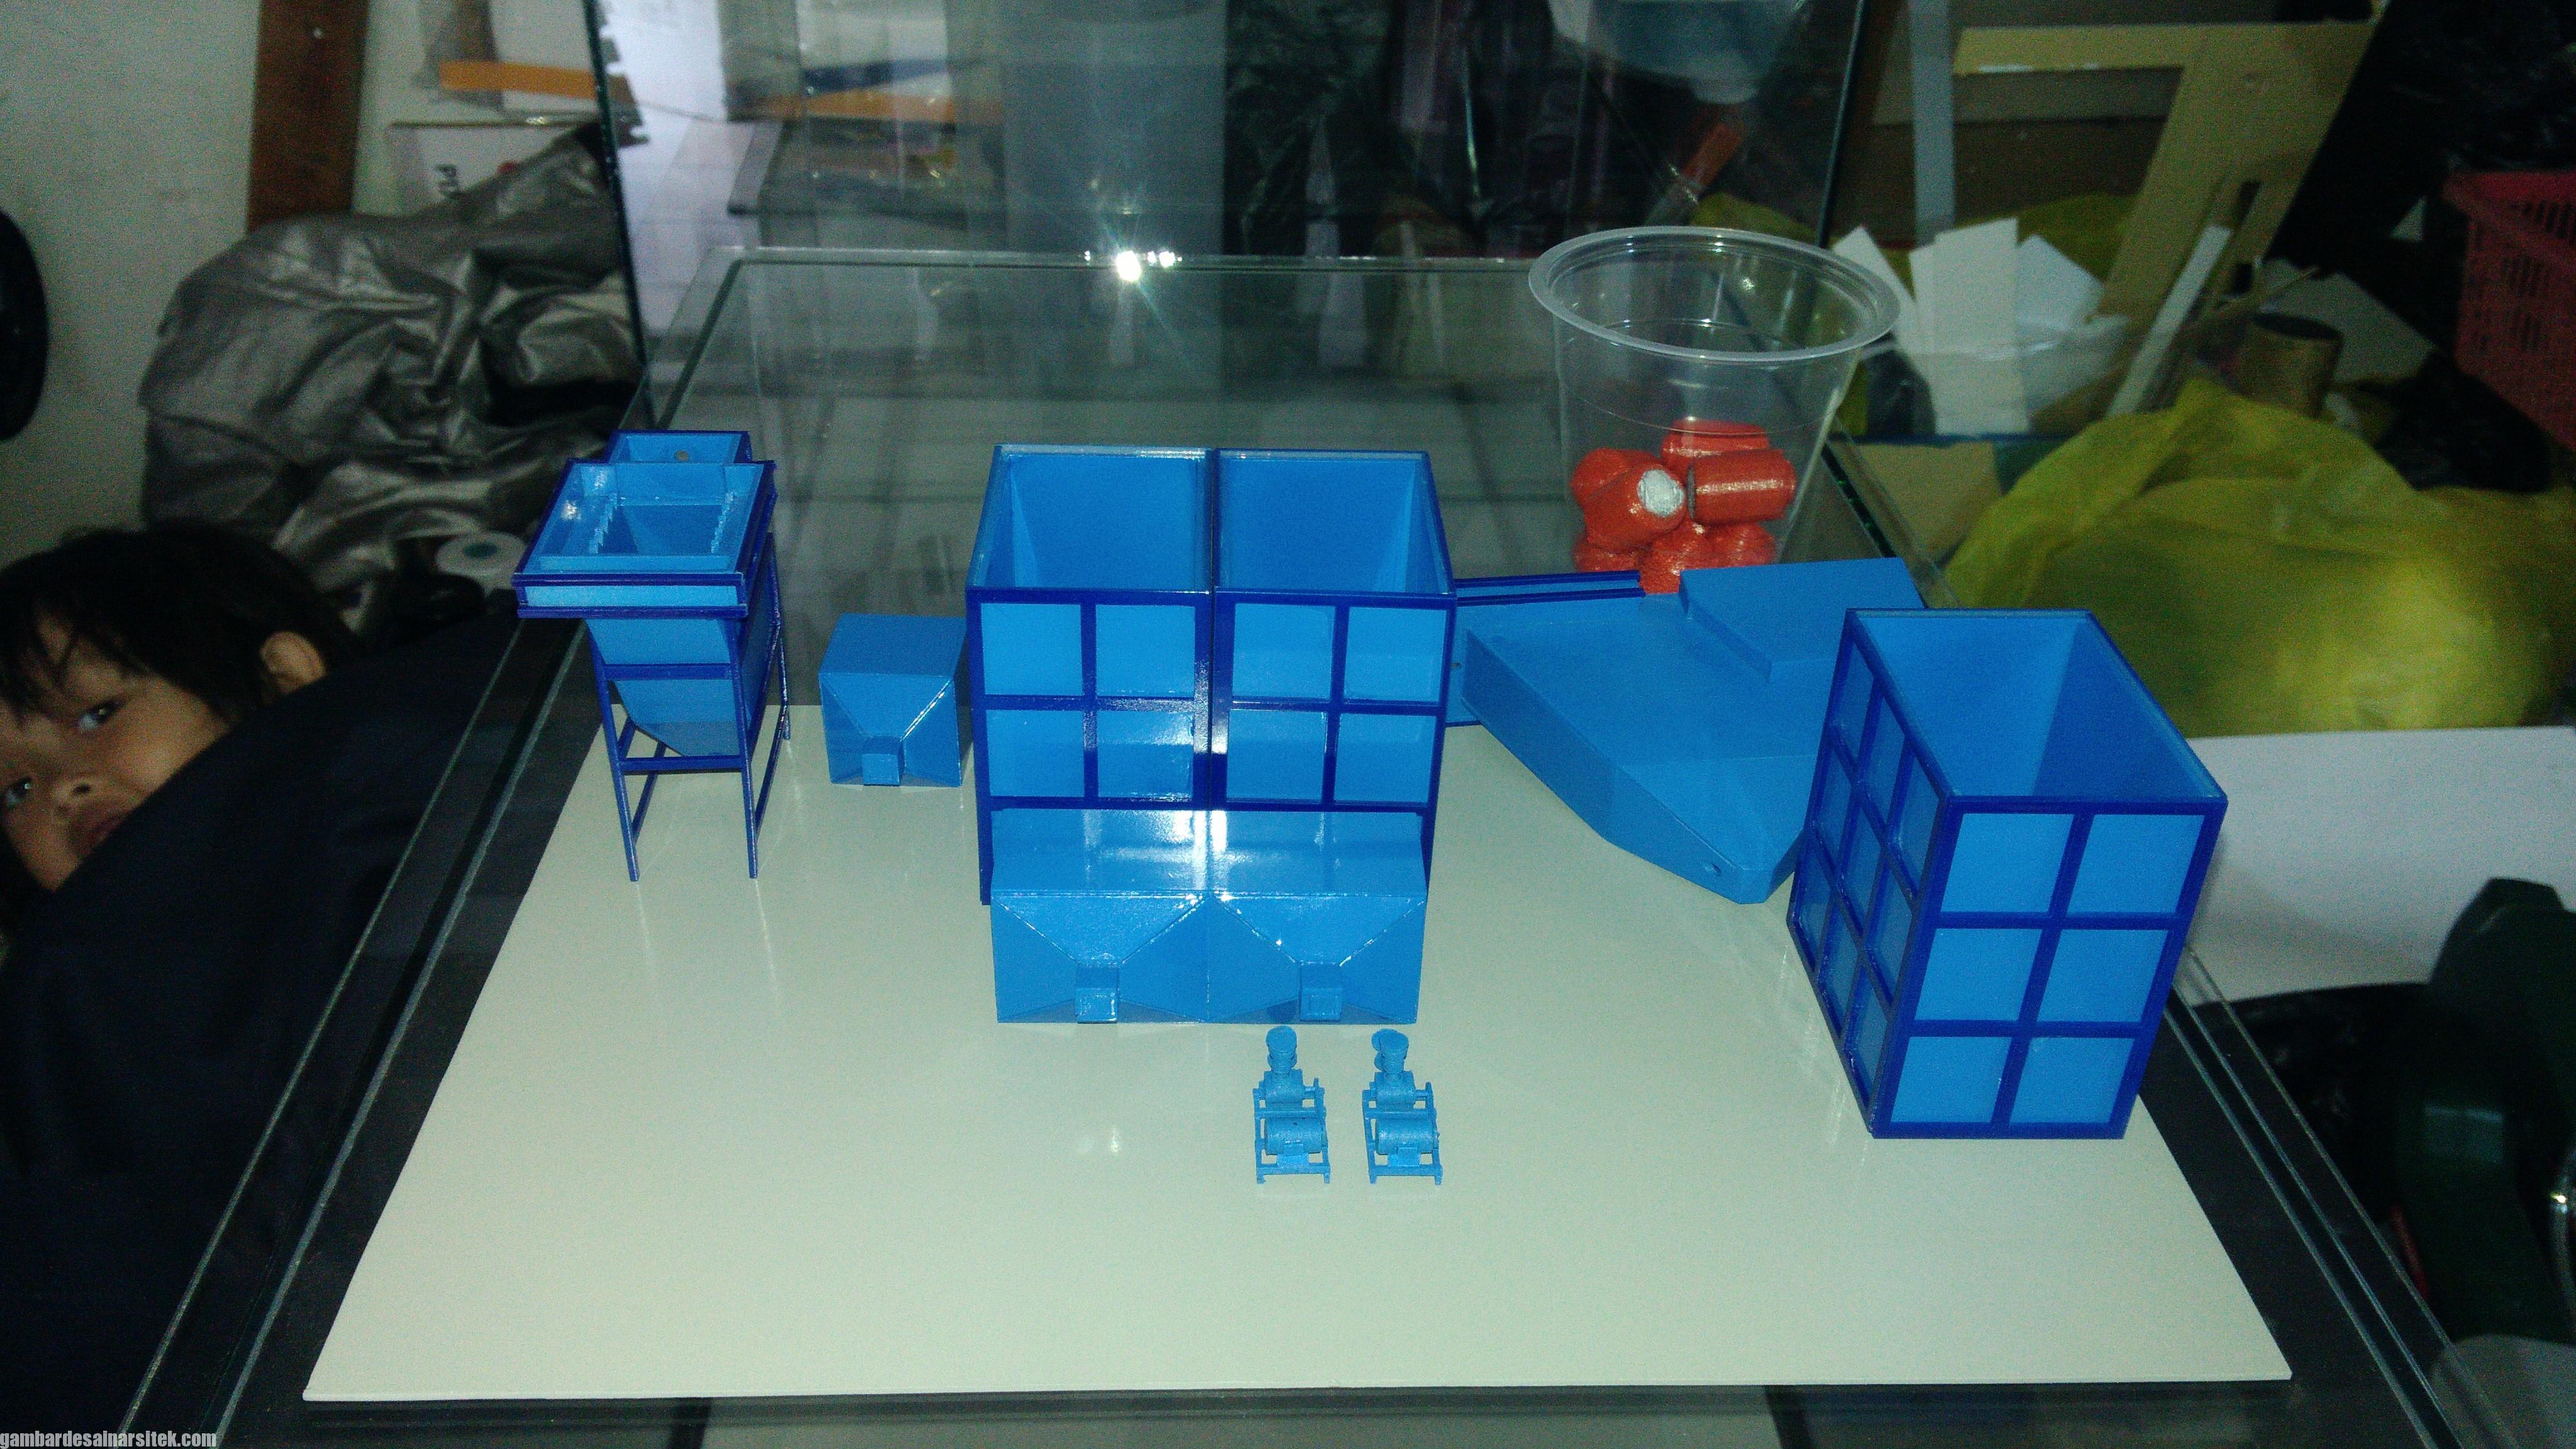 Maket Arsitektur Miniatur Model 36 Permesinan Pengolahan Limbah (11)